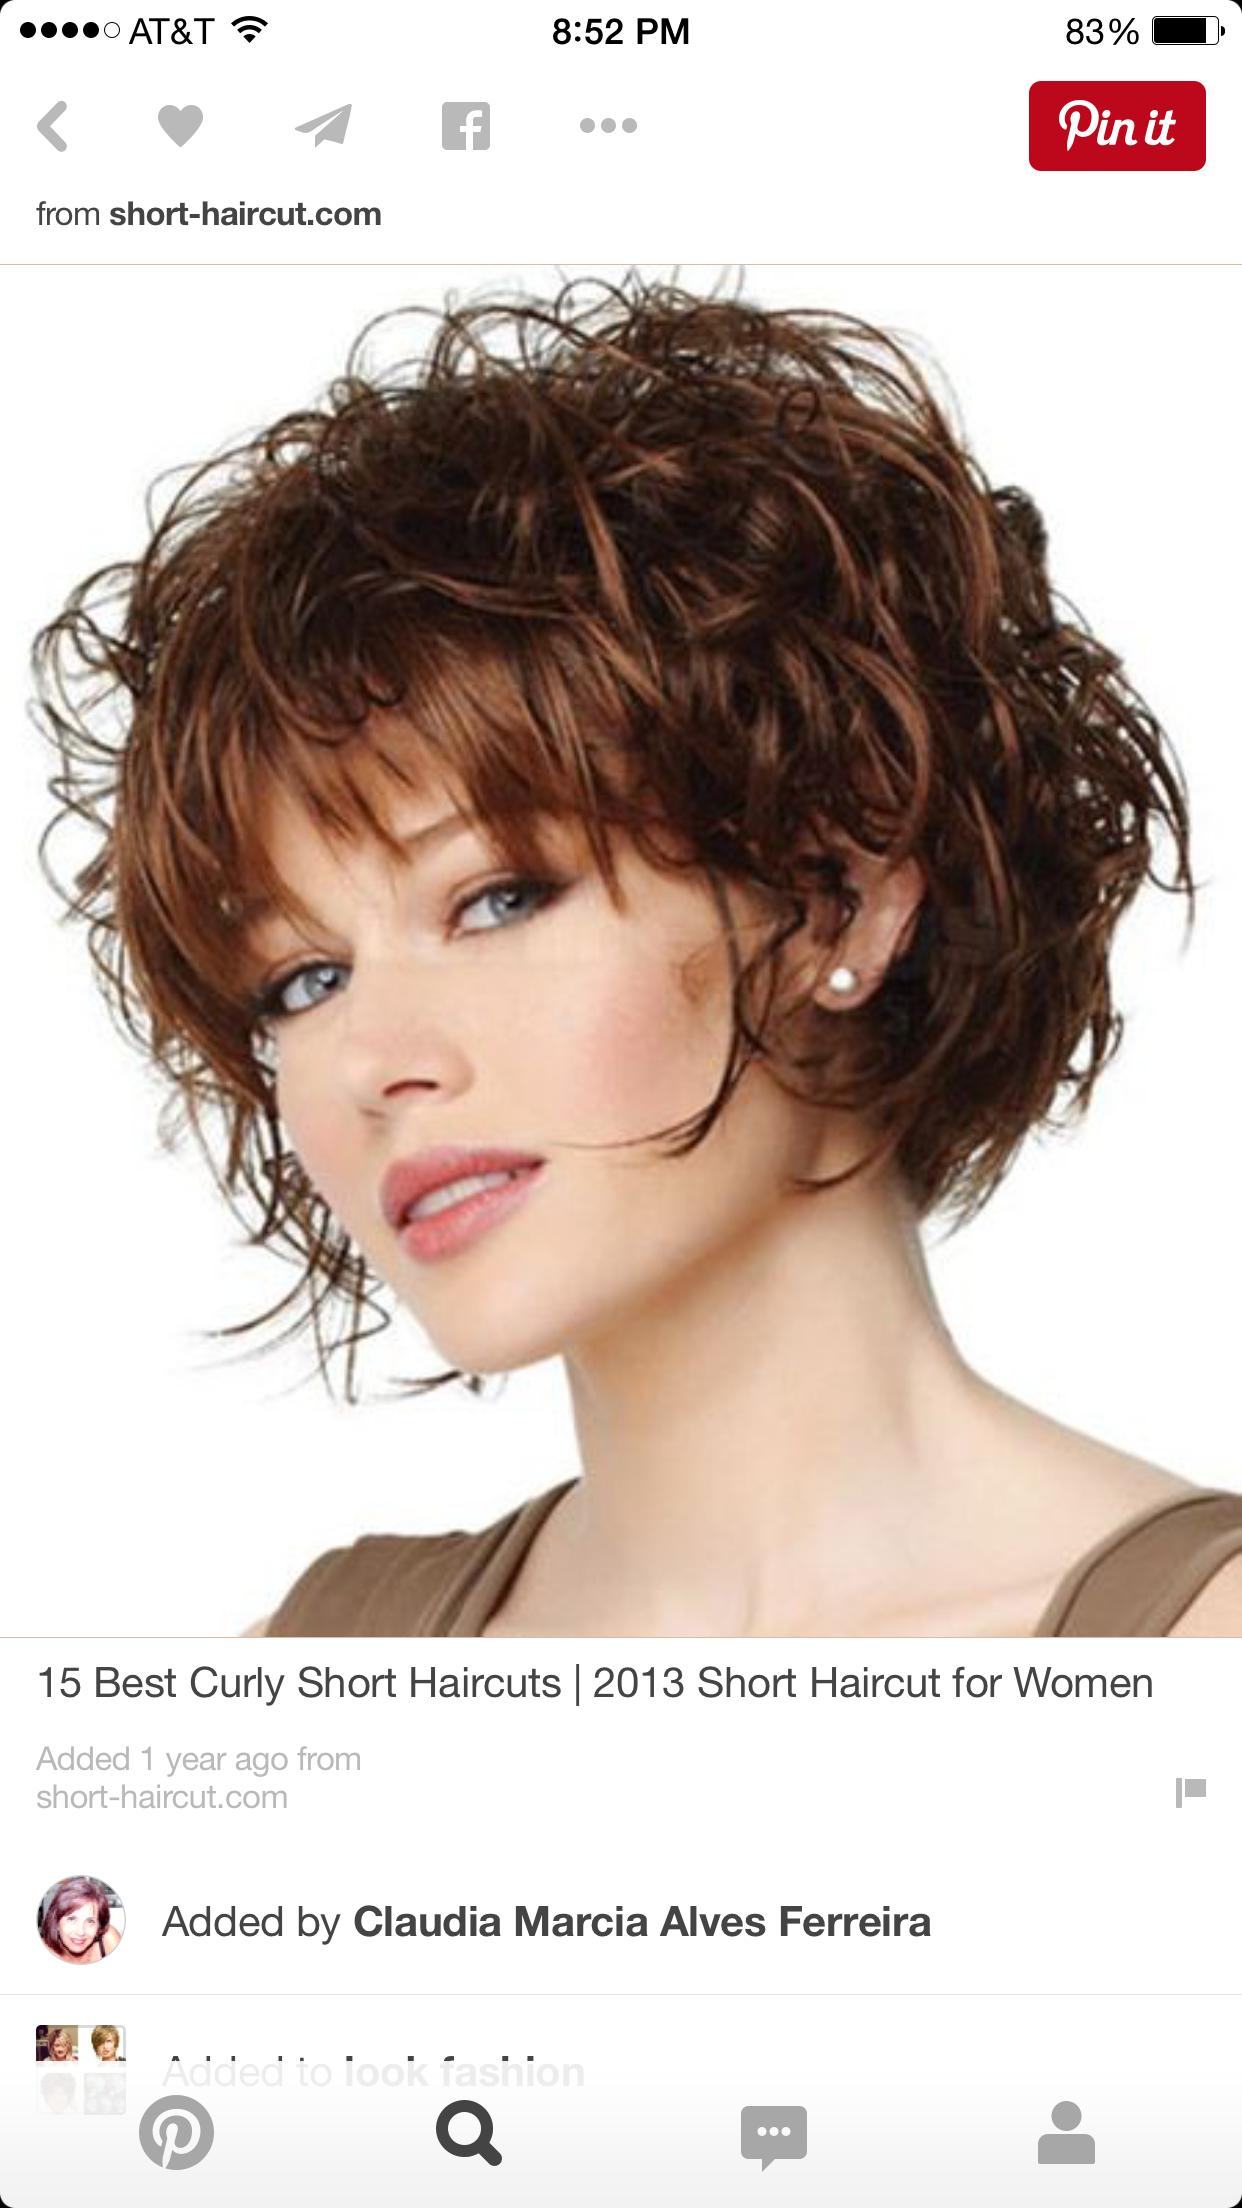 Pin by susan marley on fav hair cuts pinterest hair style hair